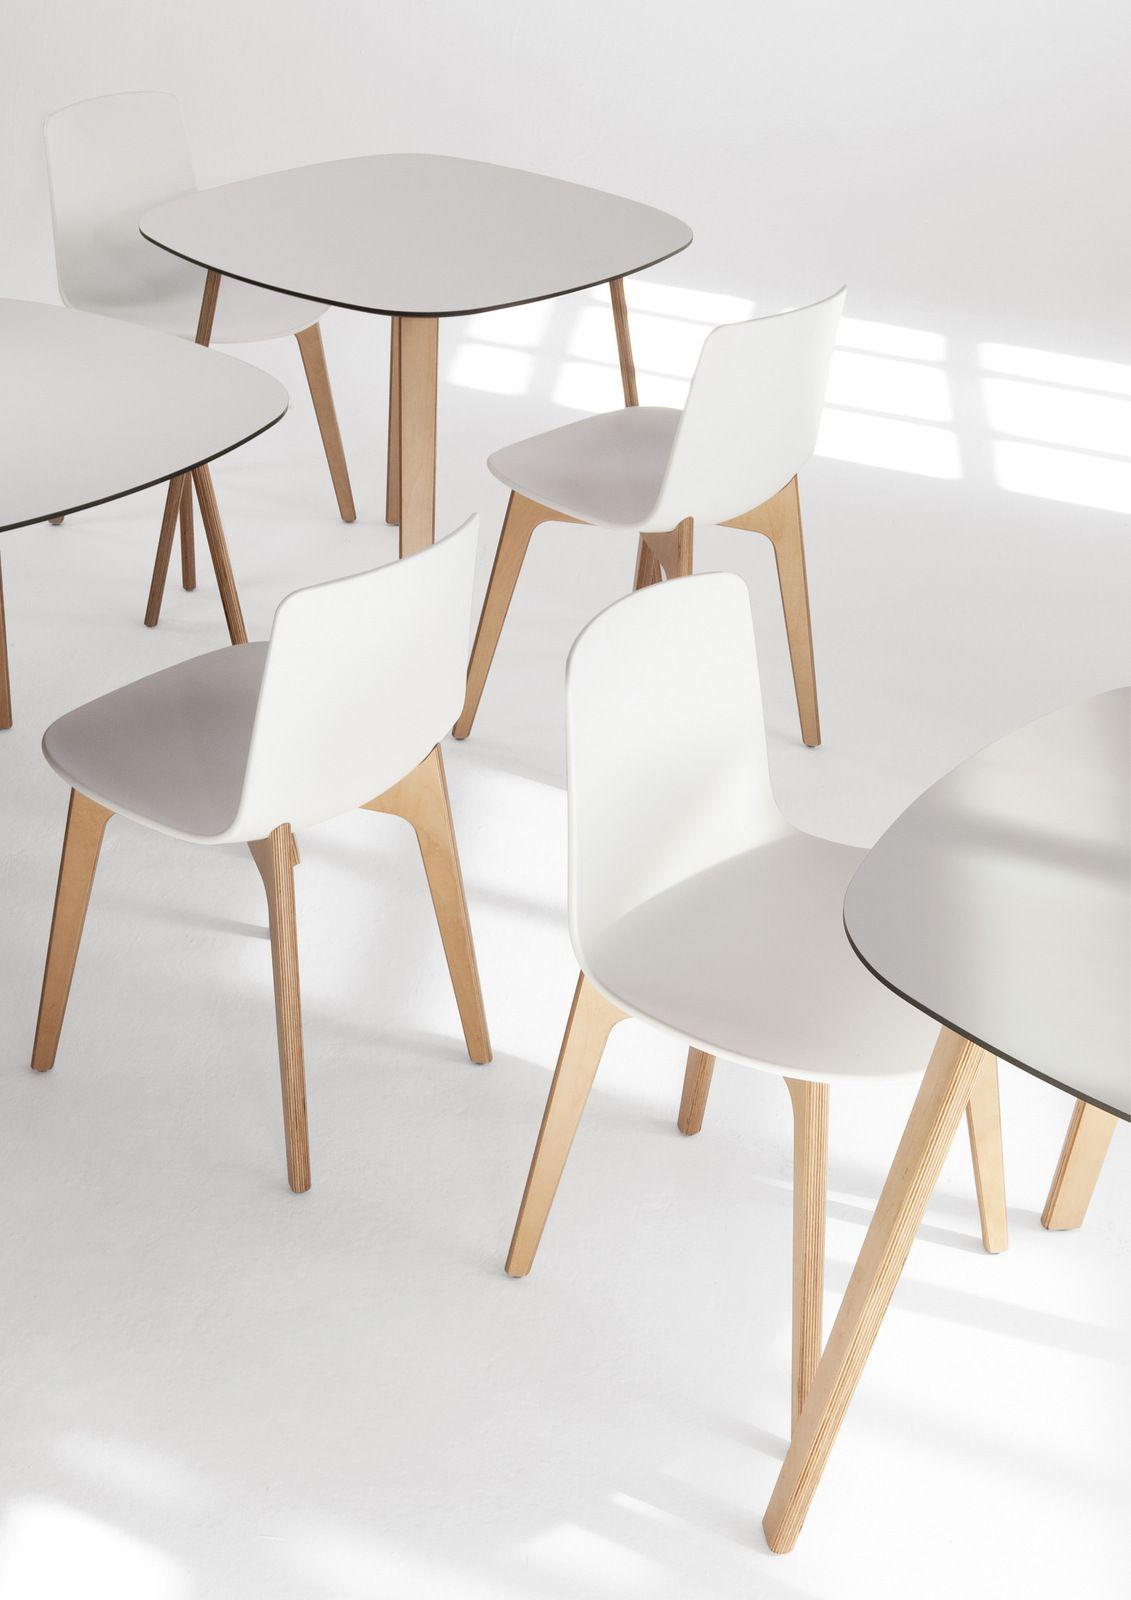 lottus wood tisch by enea design lievore altherr molina. Black Bedroom Furniture Sets. Home Design Ideas